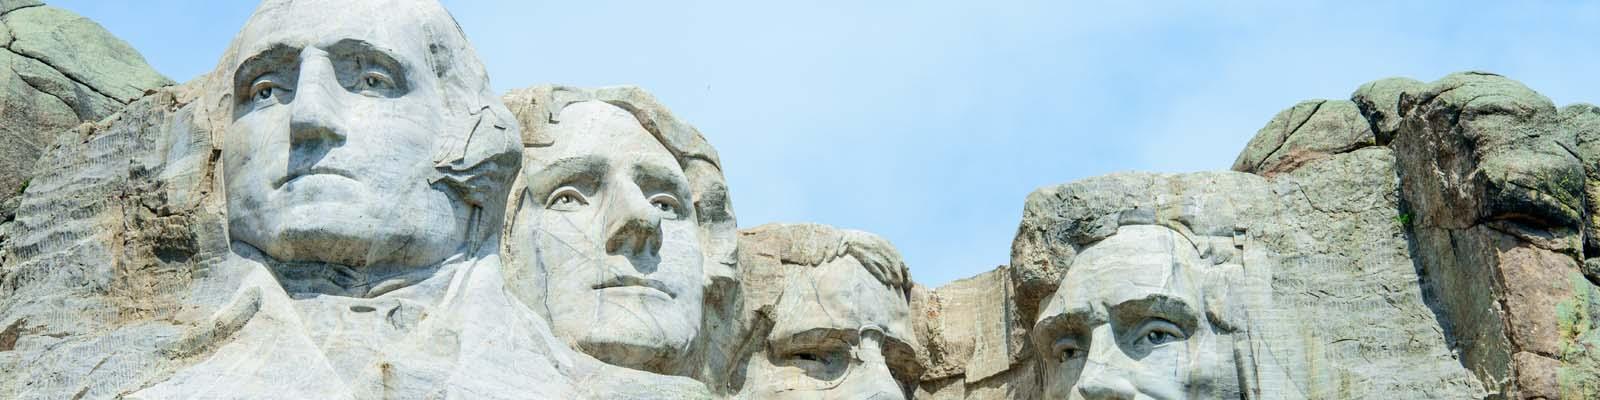 Pictured: Mt. Rushmore in South Dakota.